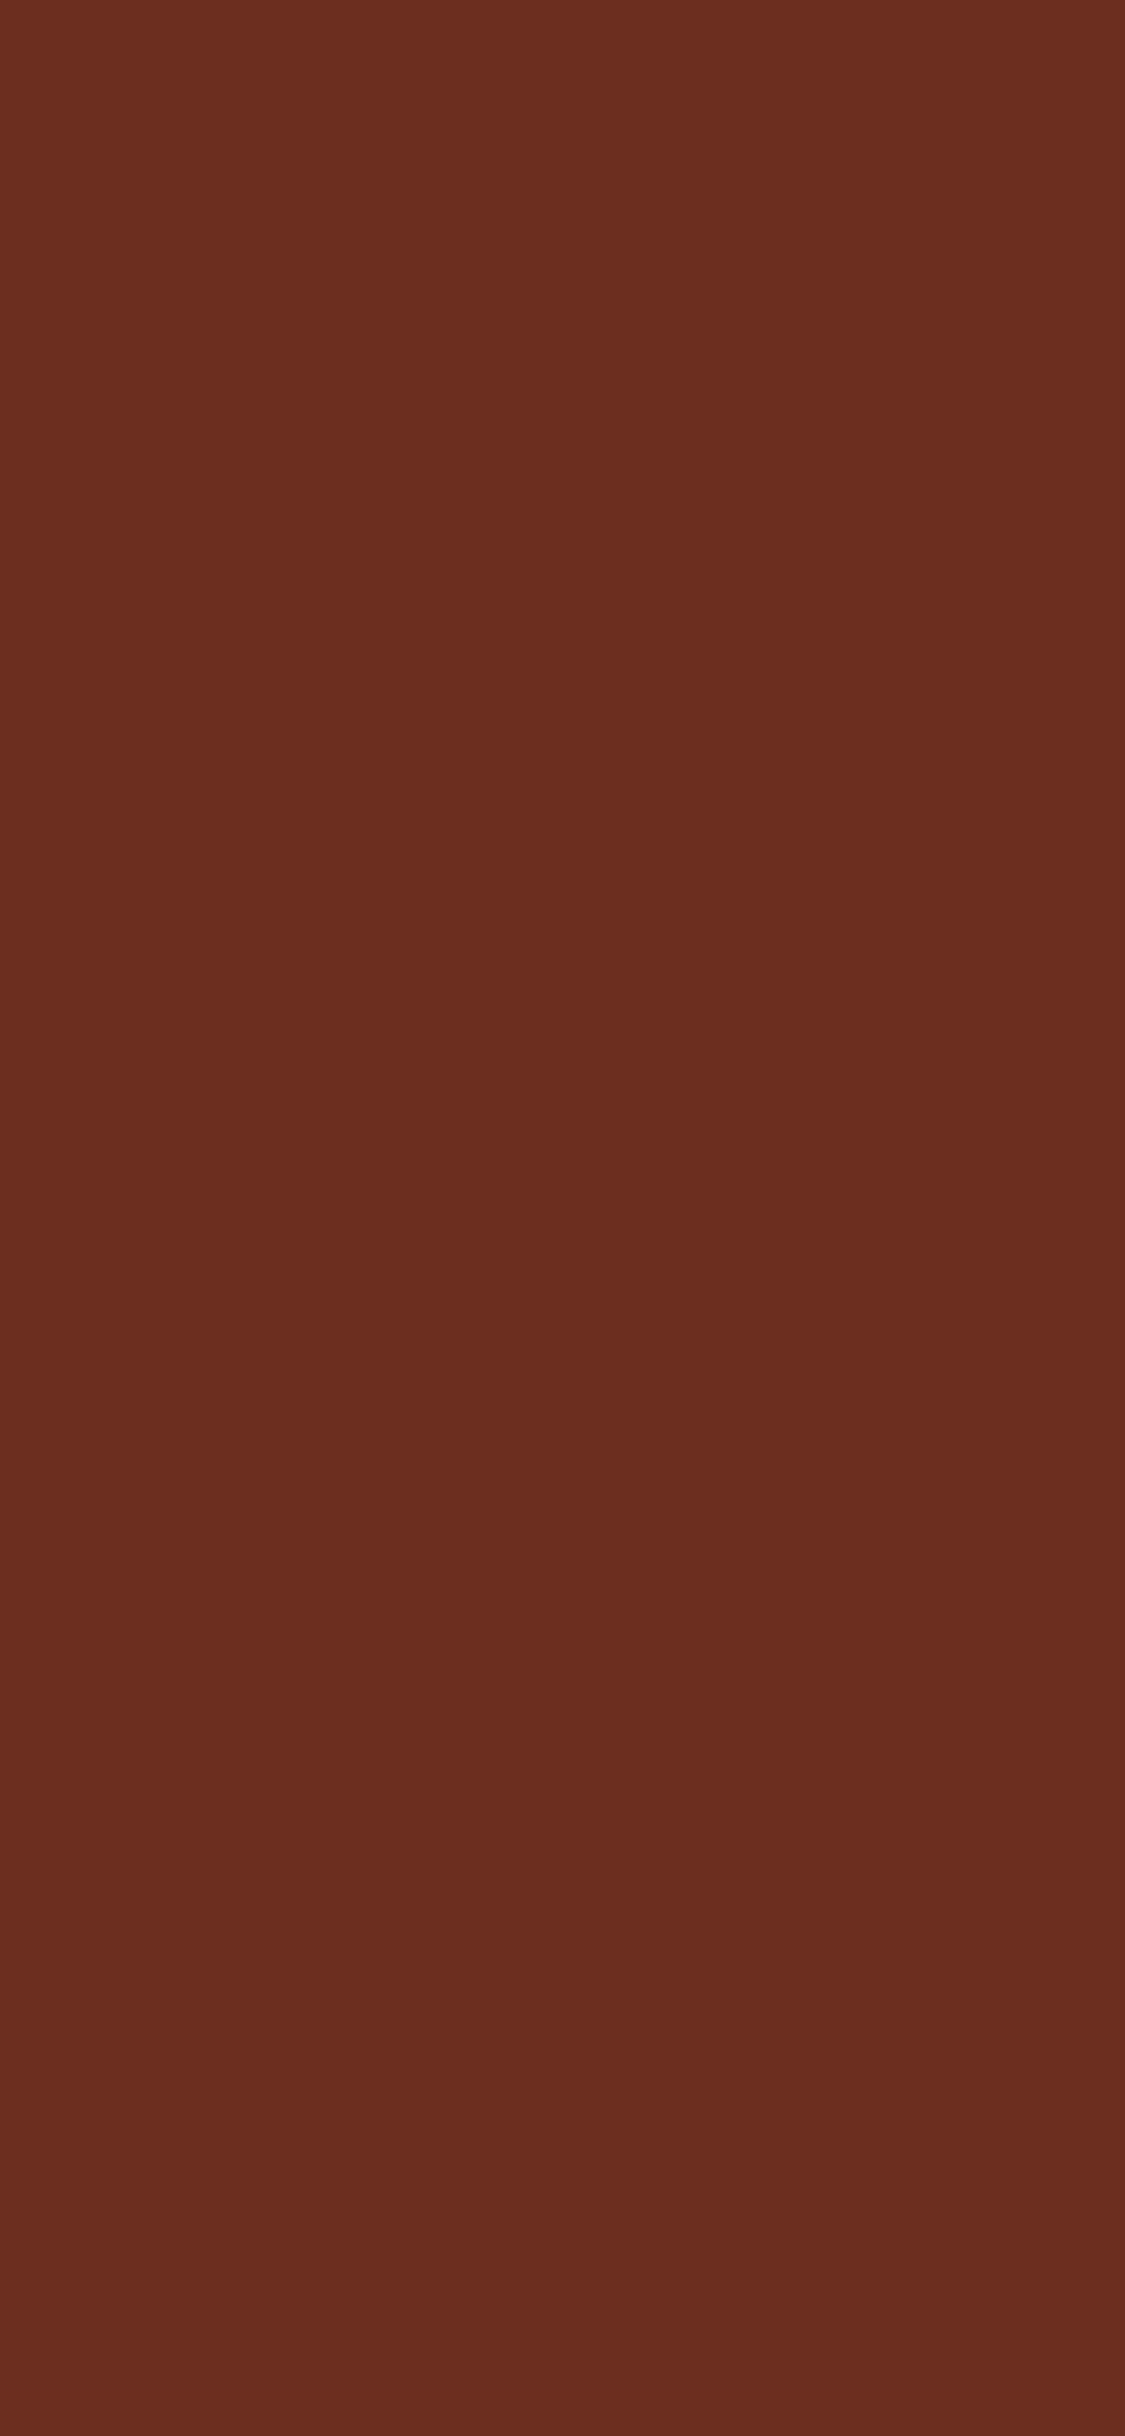 1125x2436 Liver Organ Solid Color Background